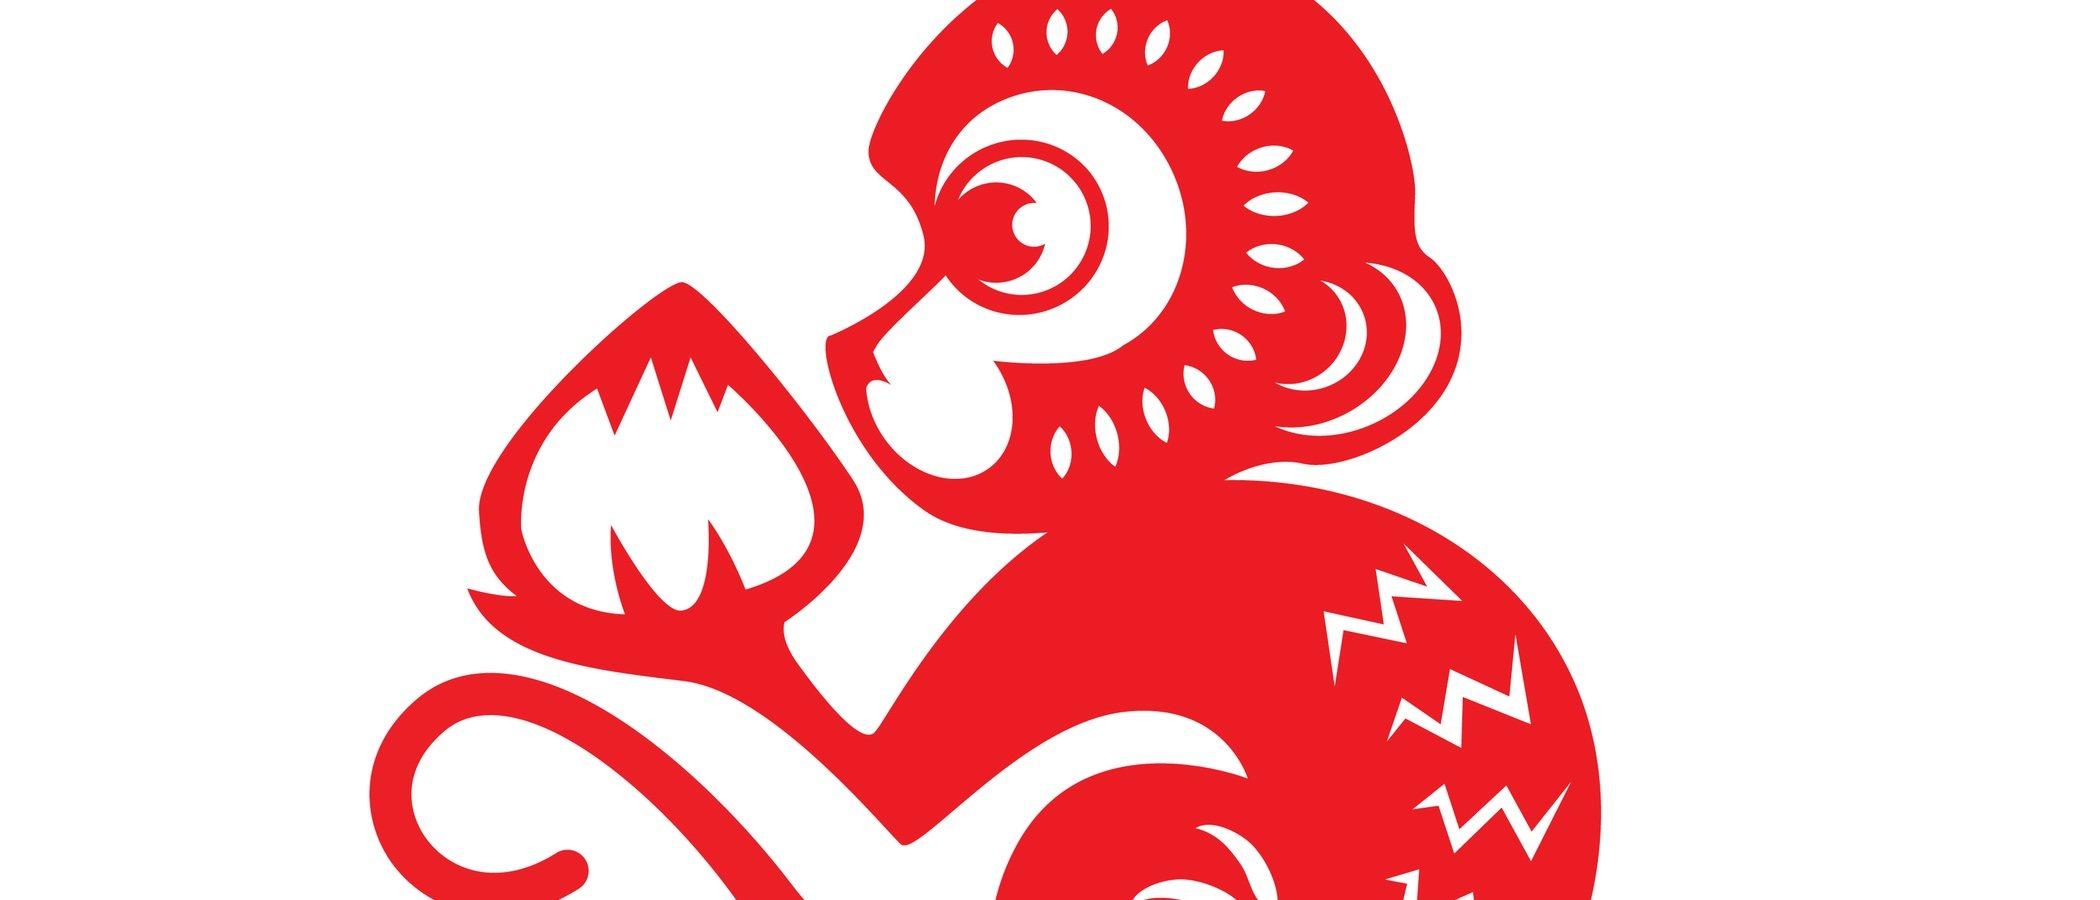 Horóscopo chino 2019: Mono